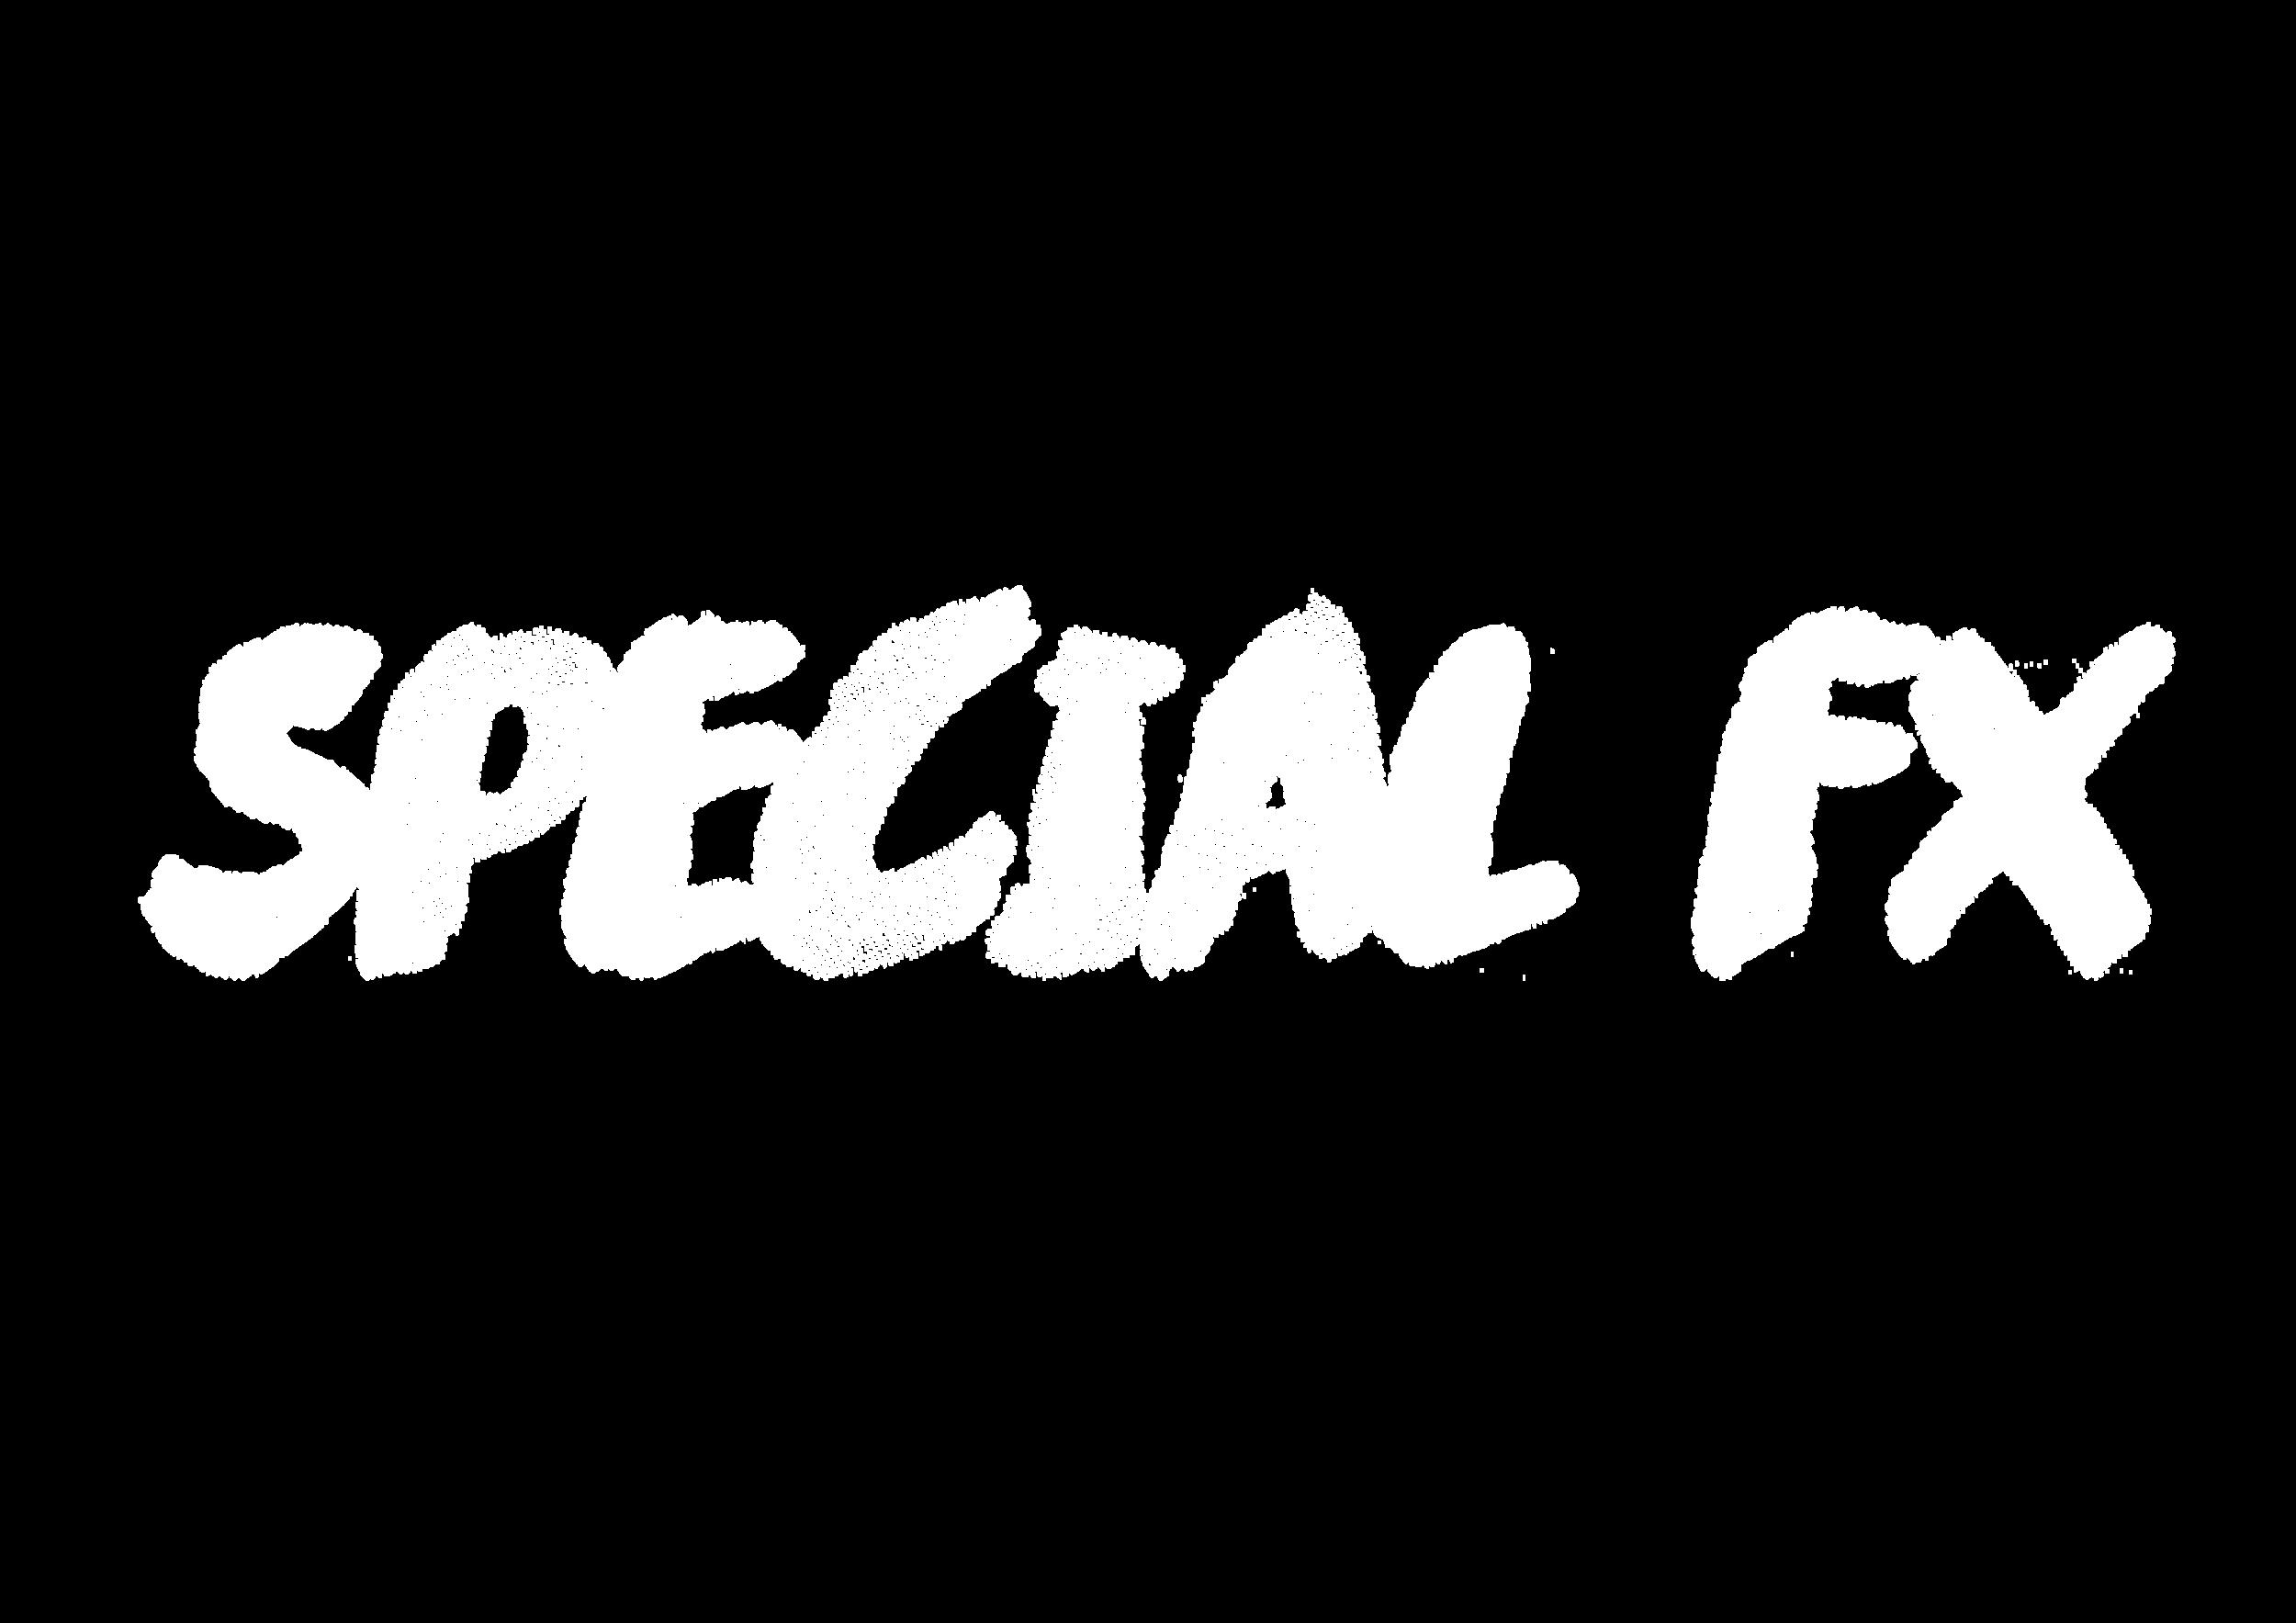 SPFX.png